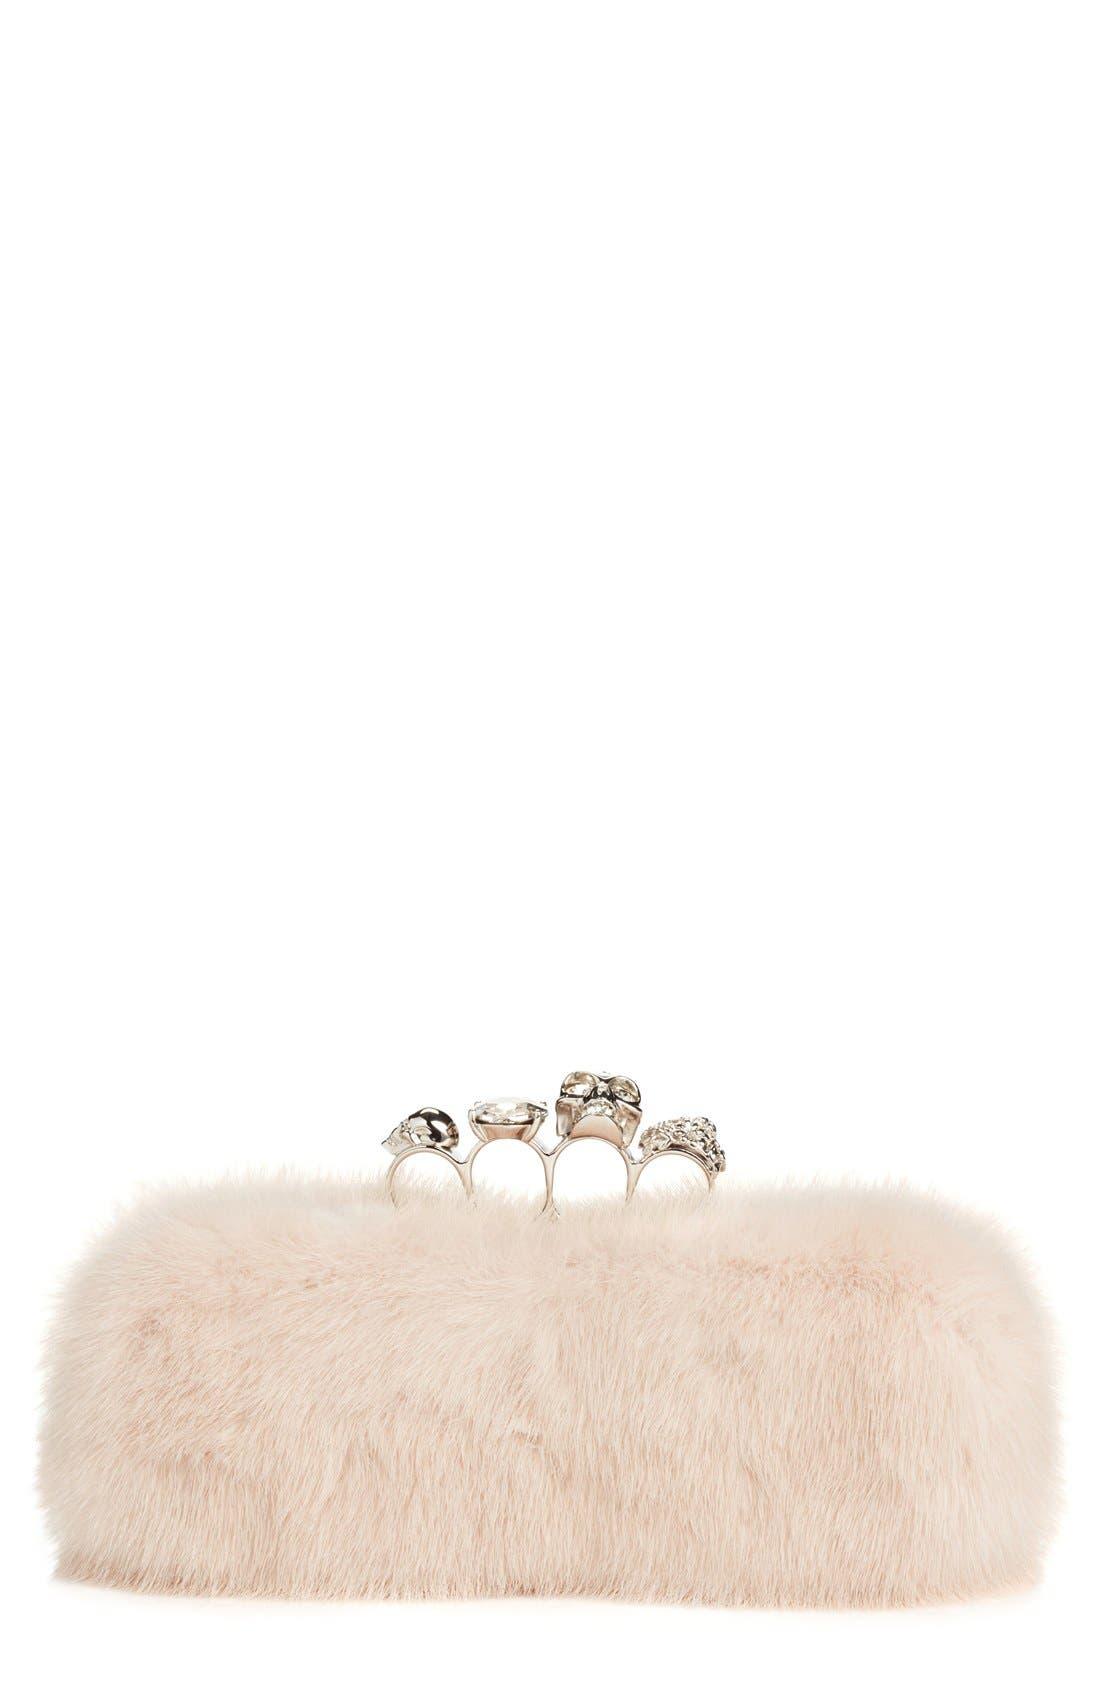 Main Image - Alexander McQueen Knuckle Clasp Genuine Mink Fur Box Clutch